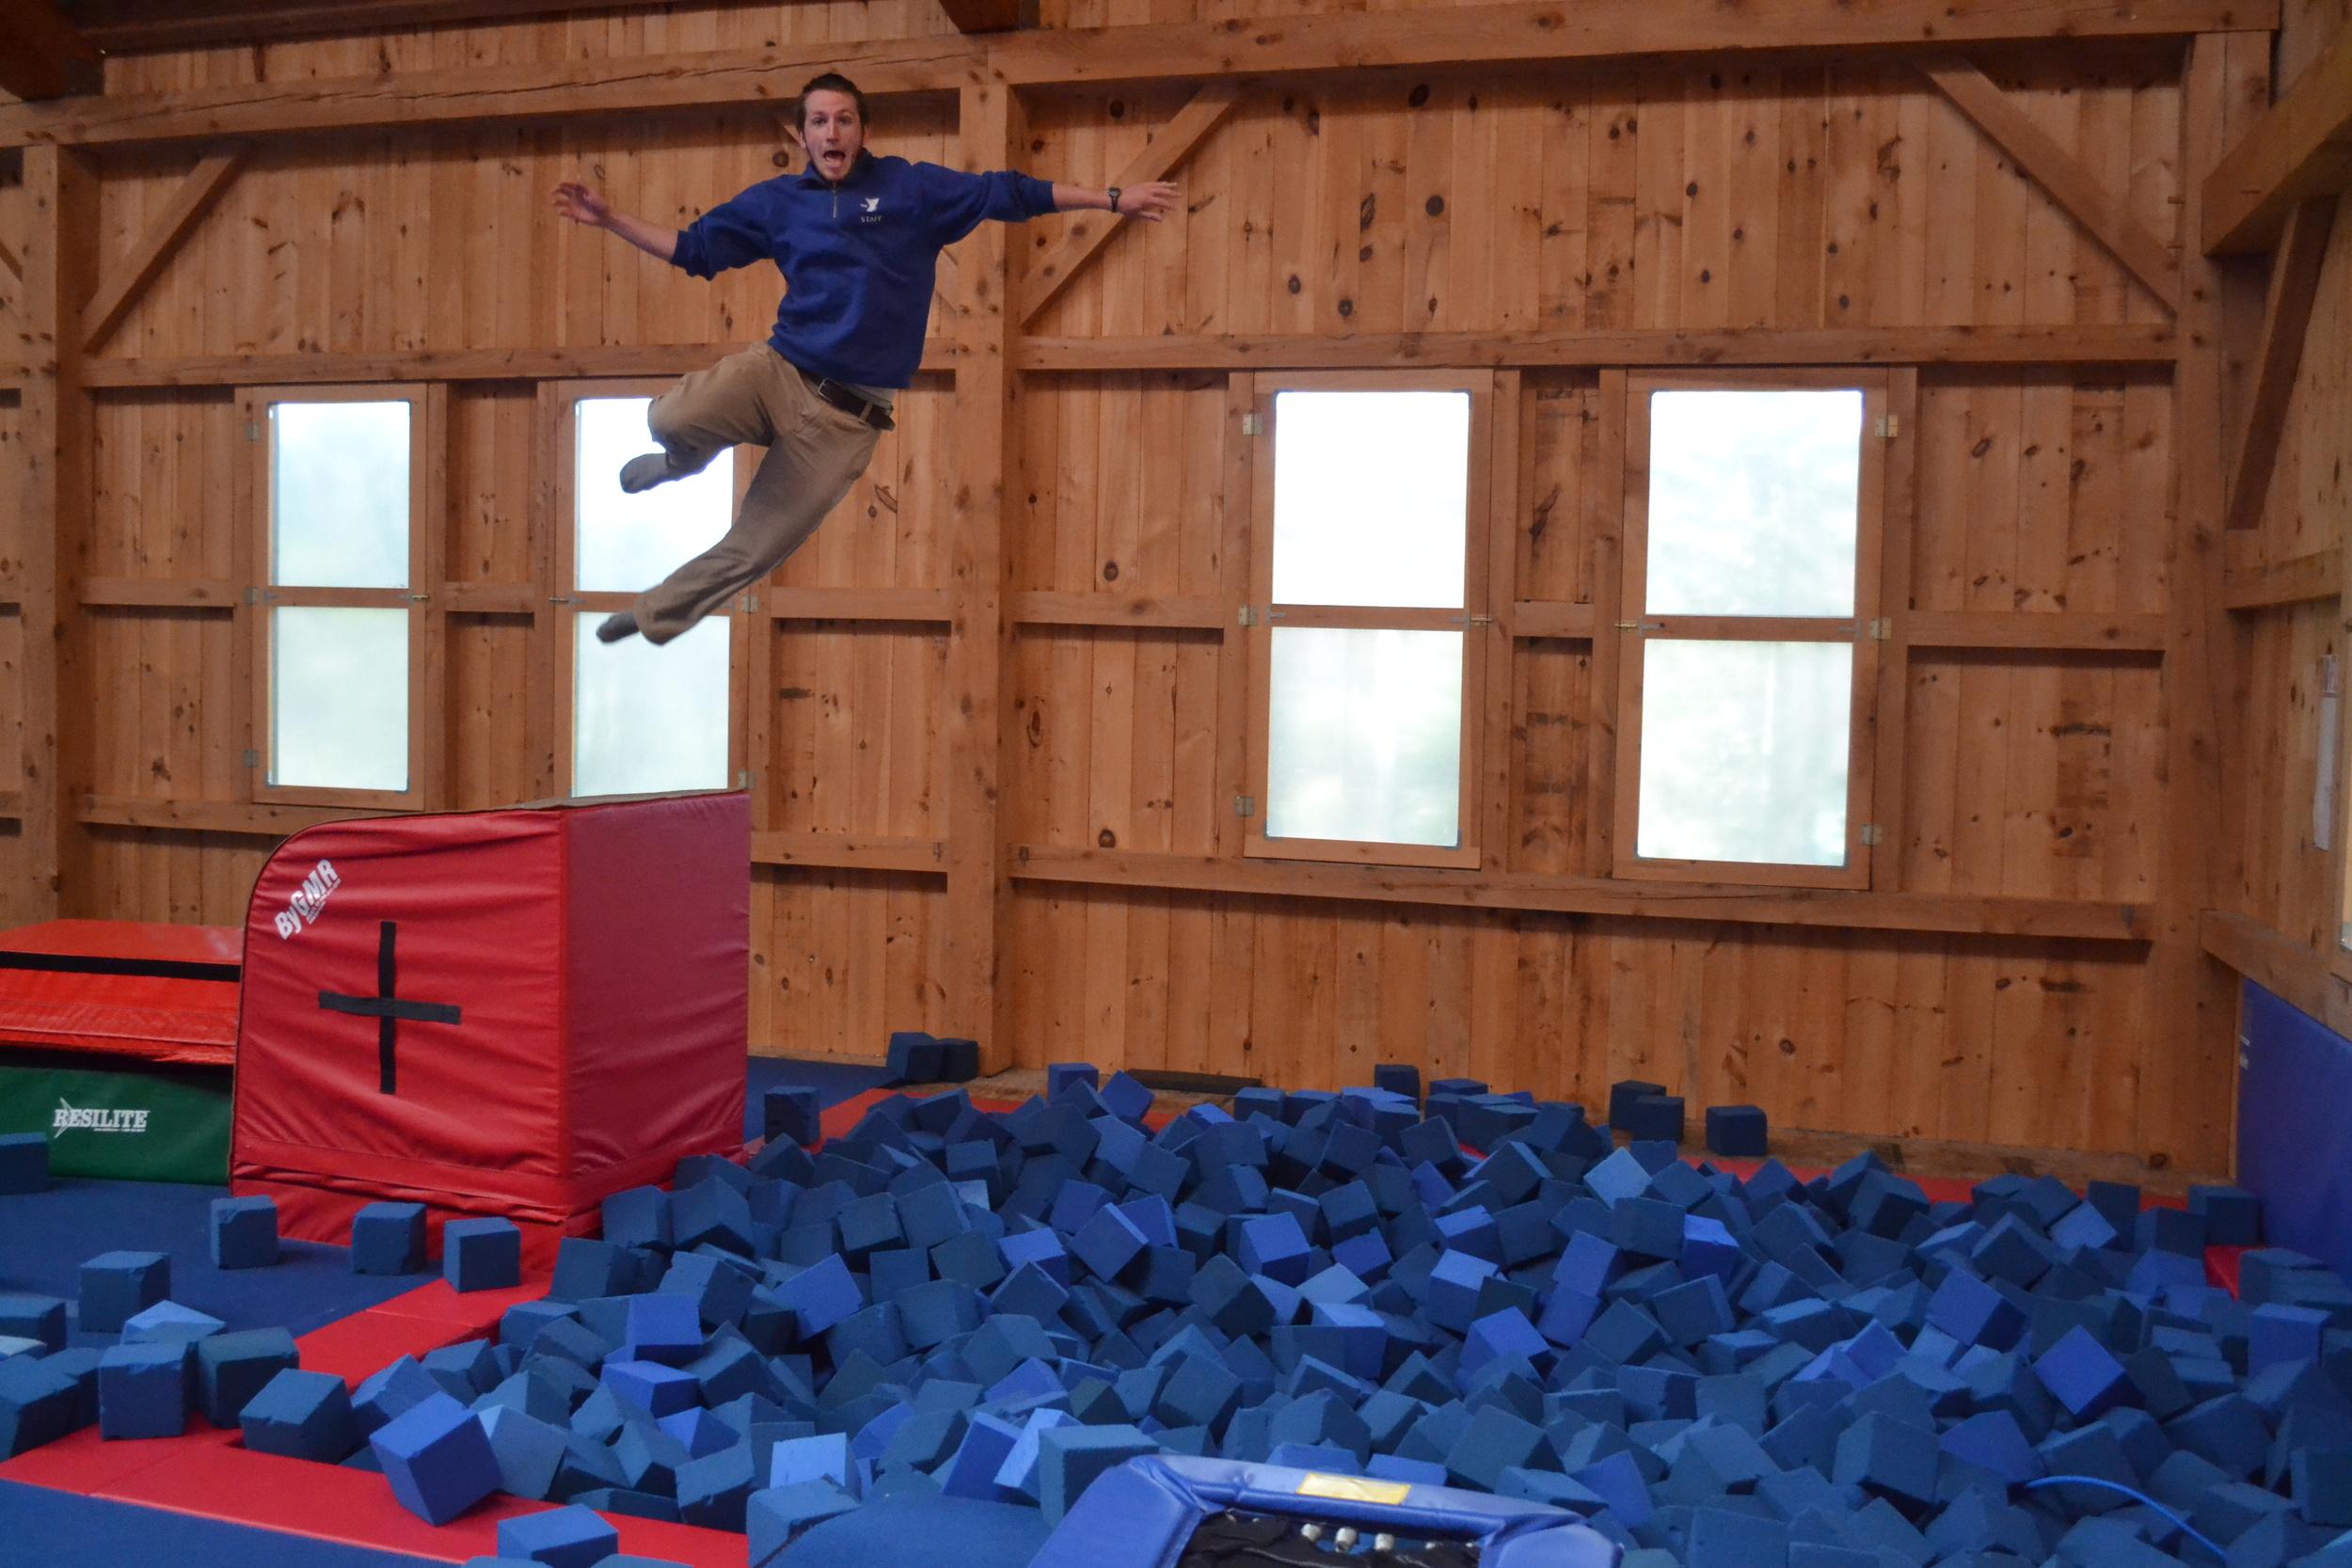 Fernwood Cove Gymnastics